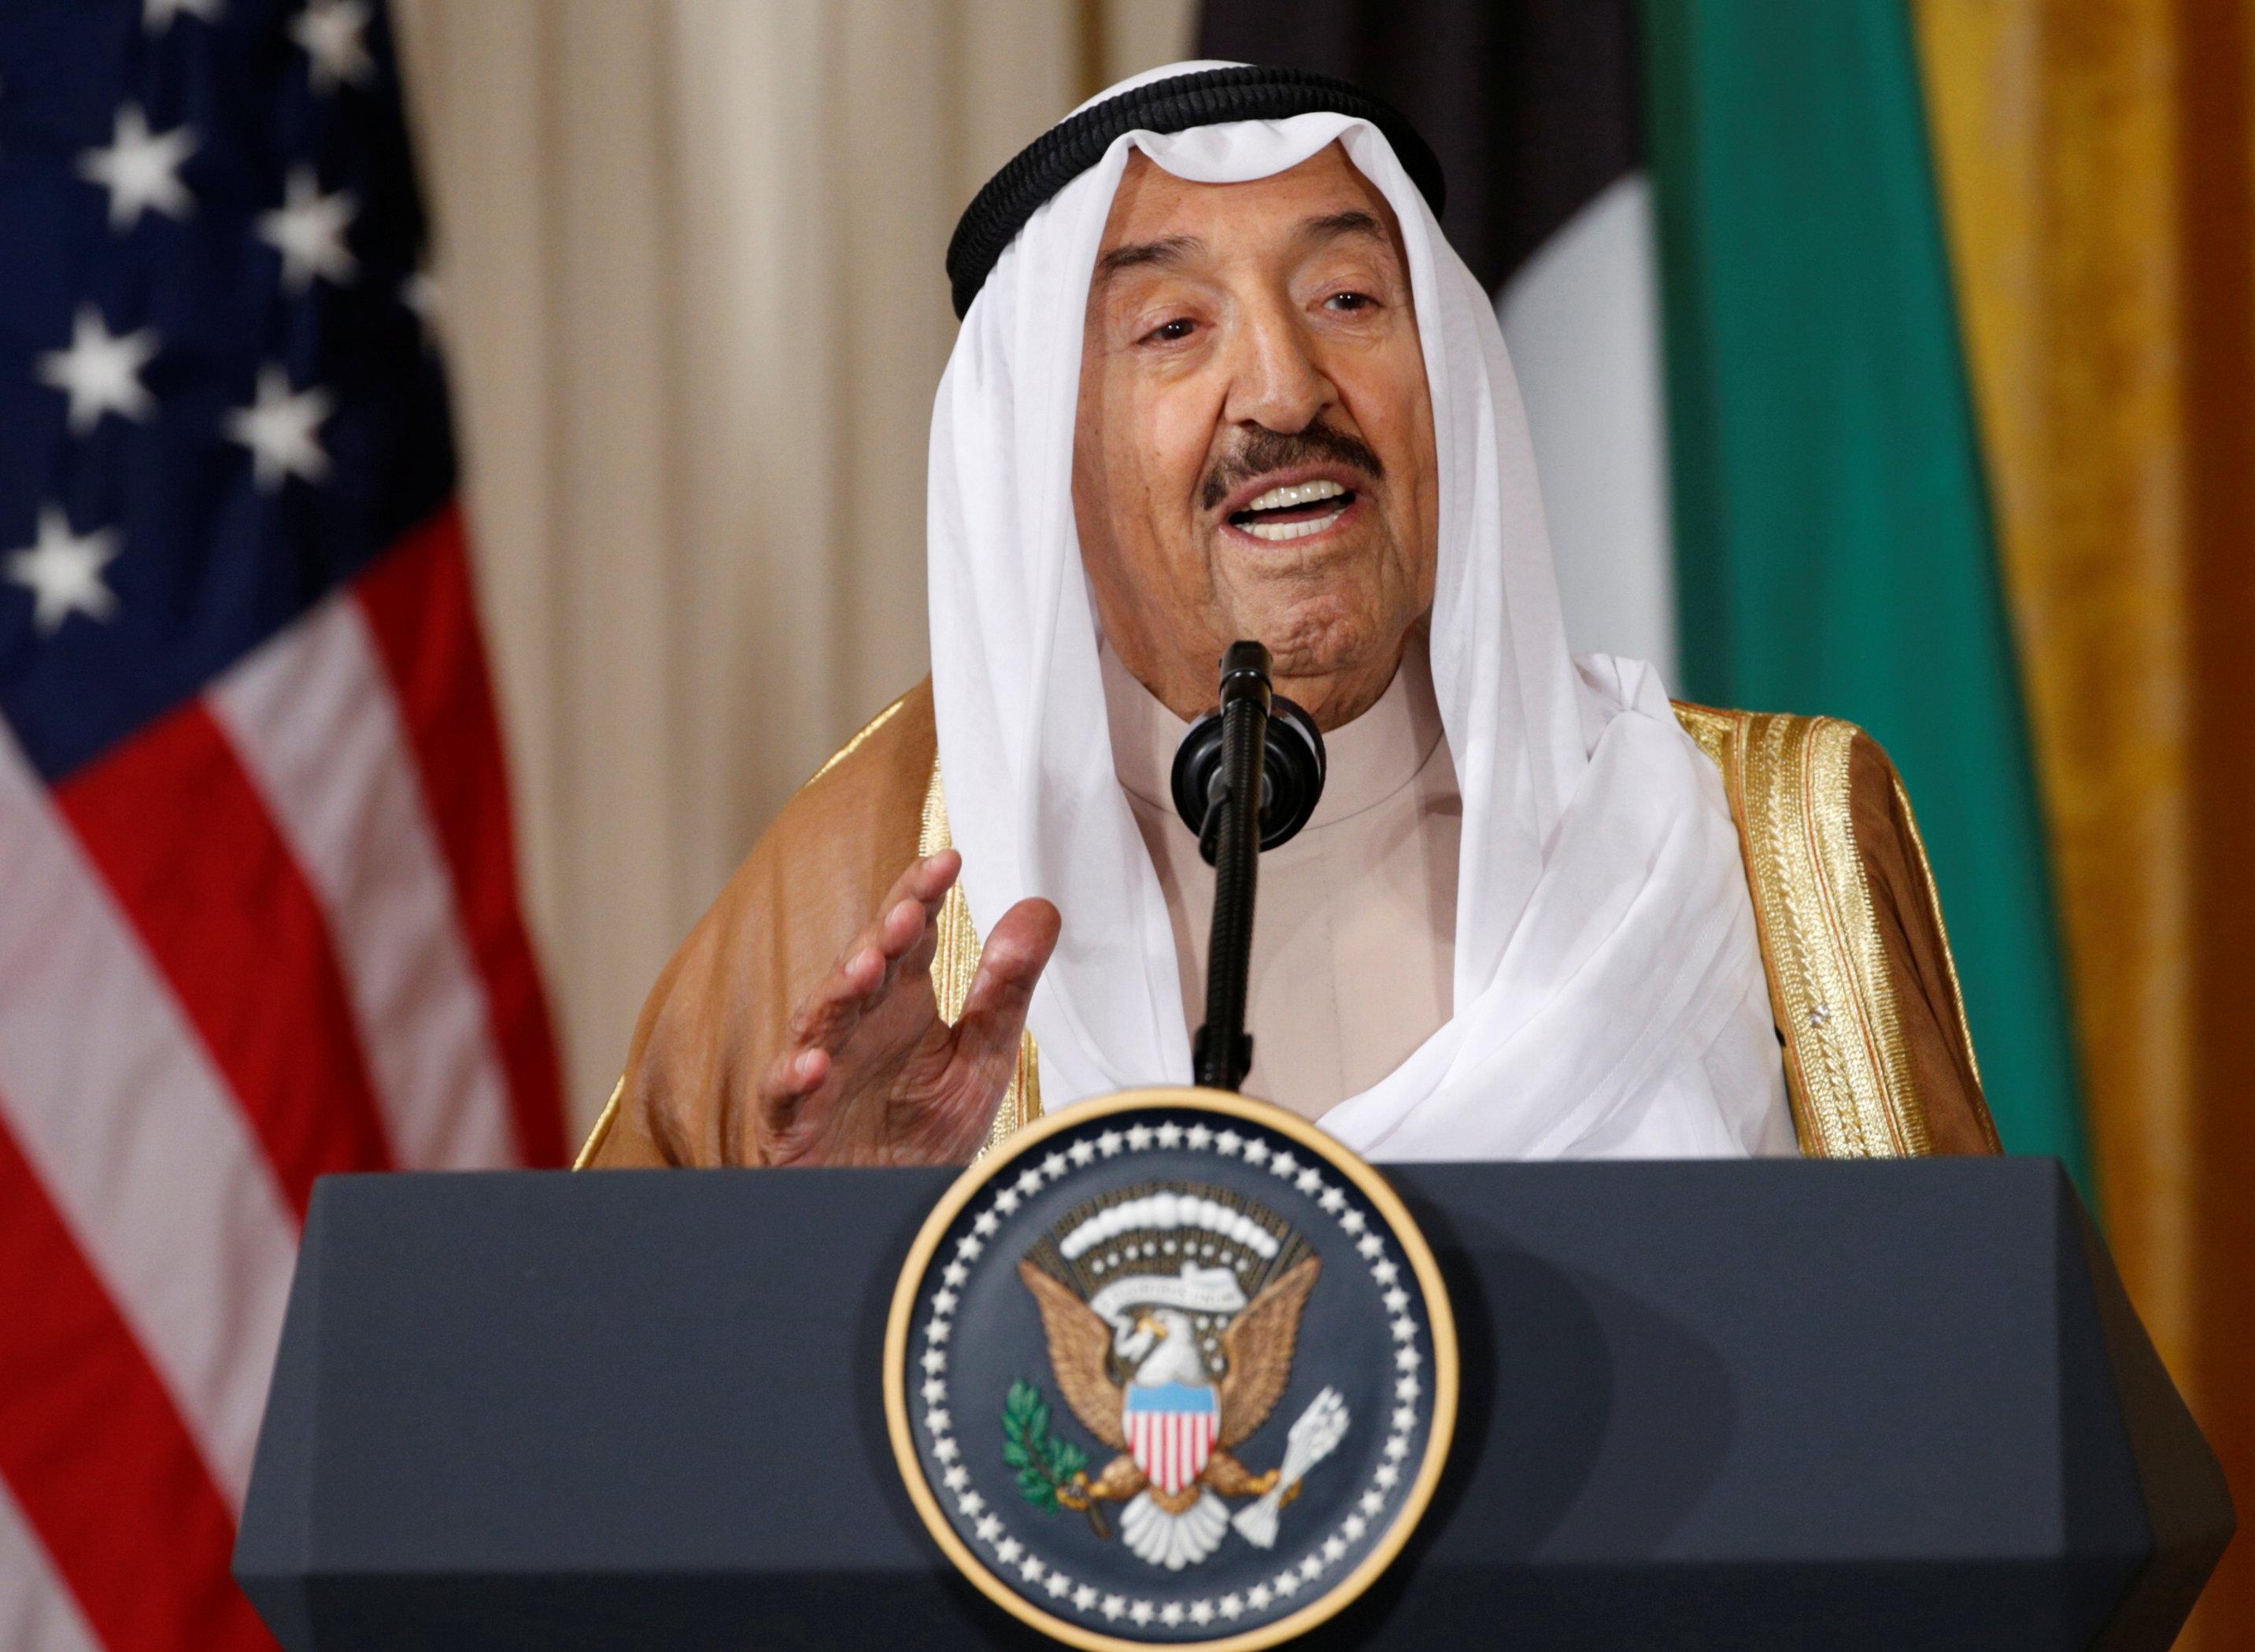 Kuwait emir announces visit to Washington, talks with Trump | The